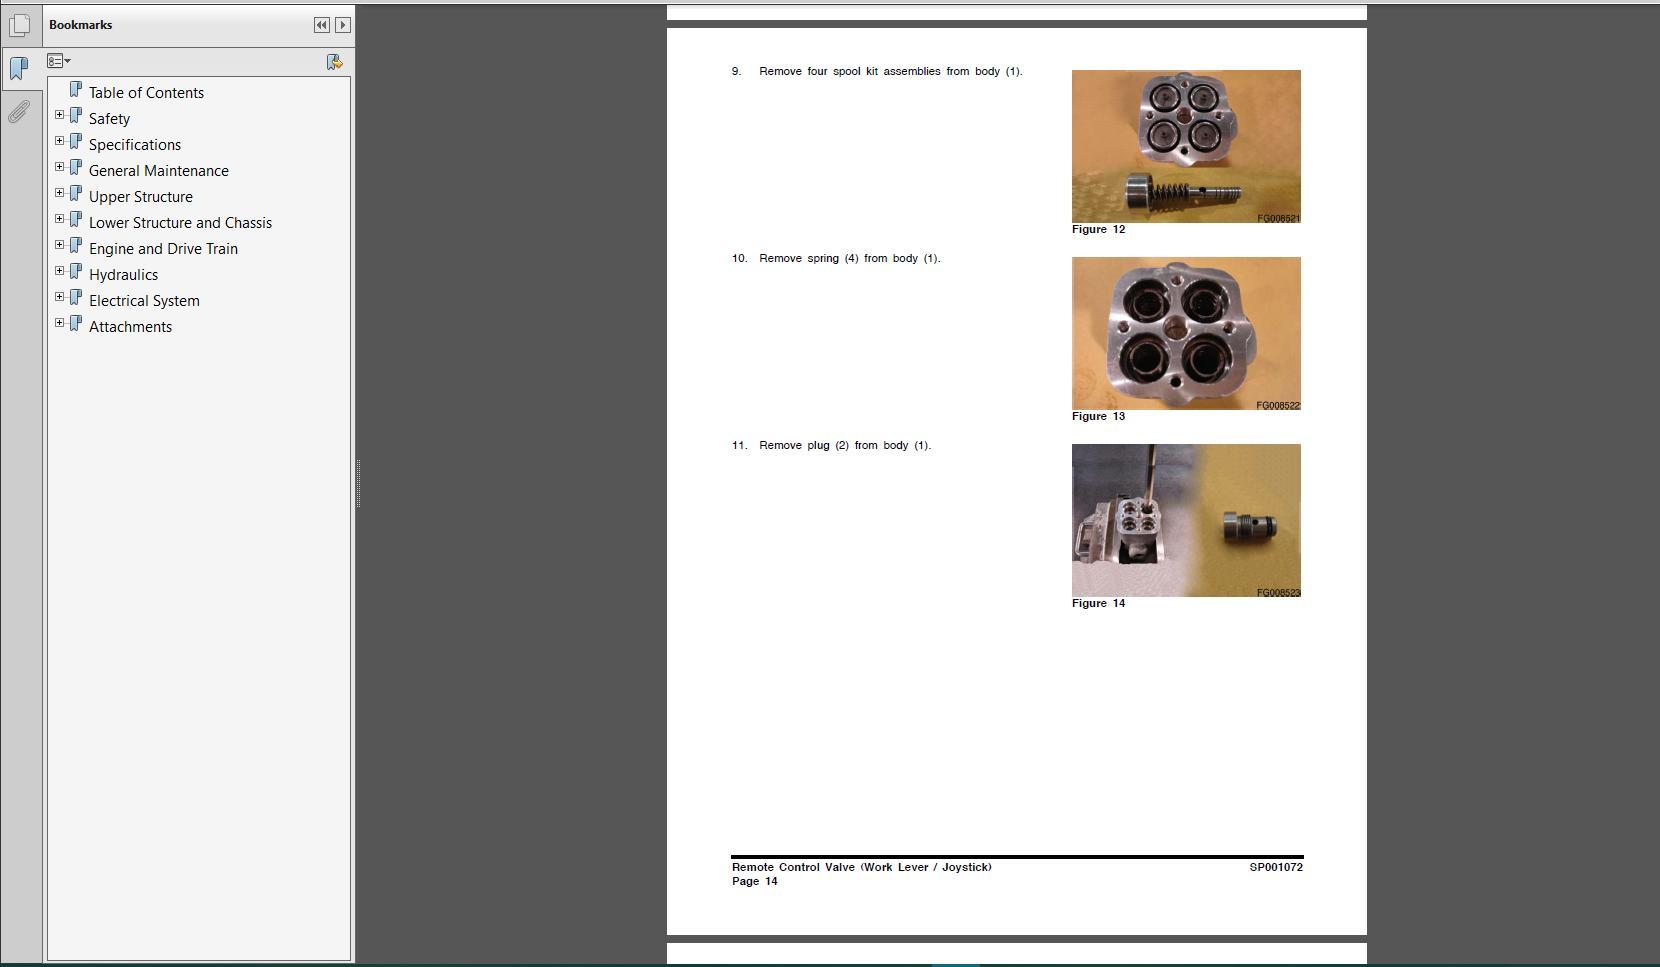 Doosan_All_Model_Full_Service_Manual_DVD8